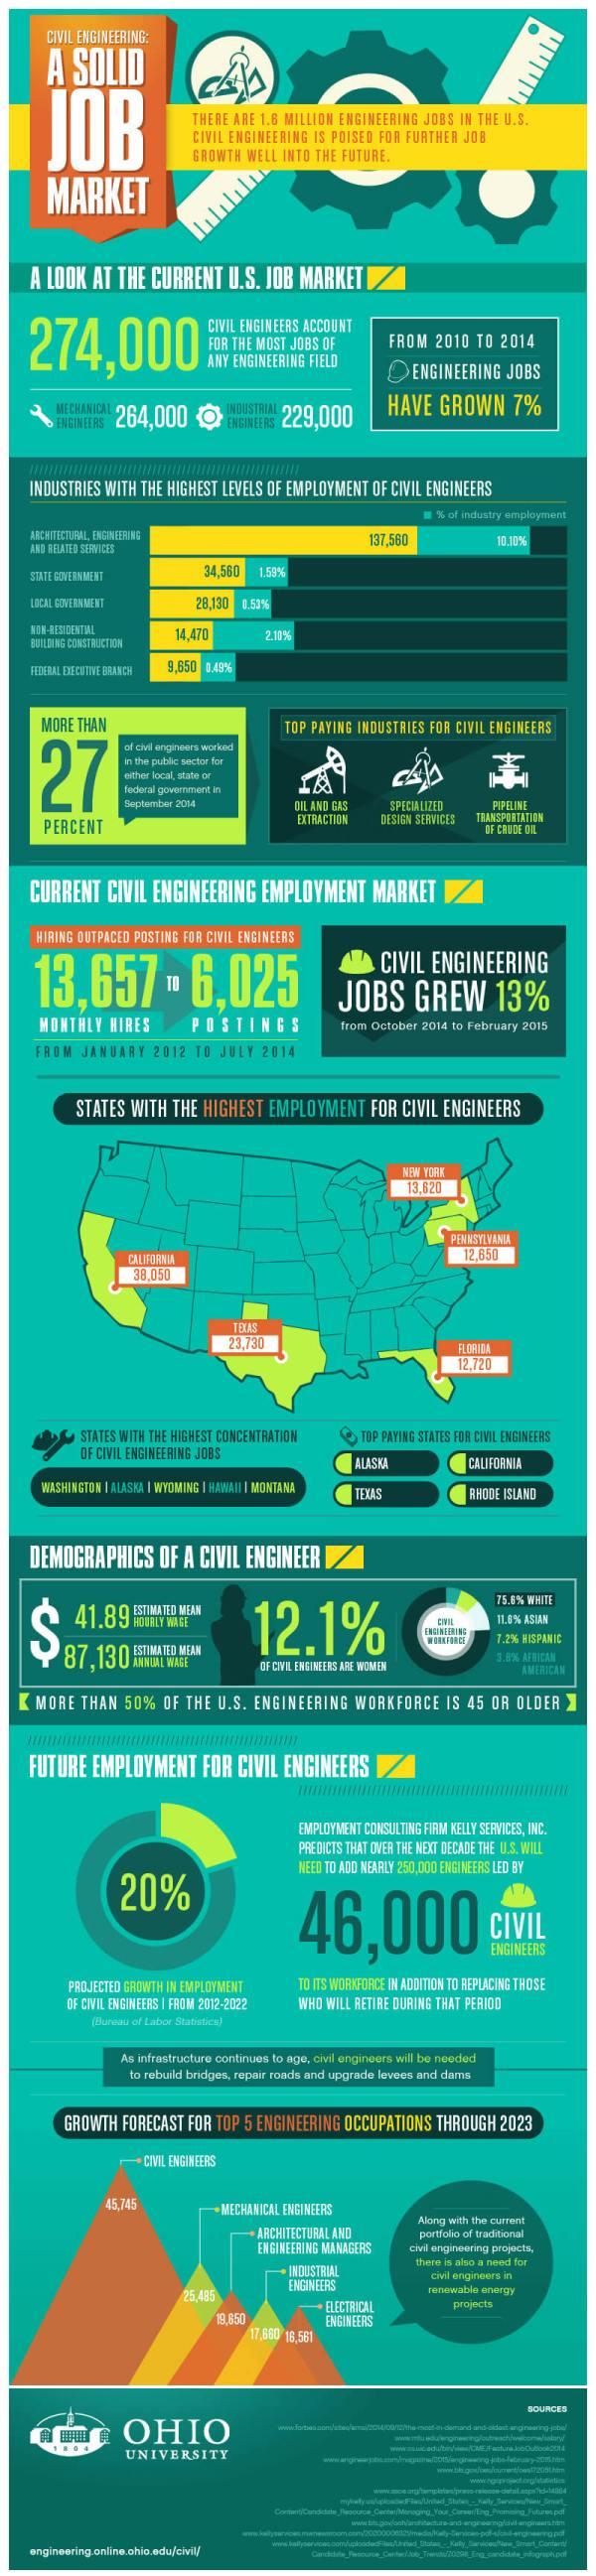 Civil Engineering Solid Job Market Ohio University